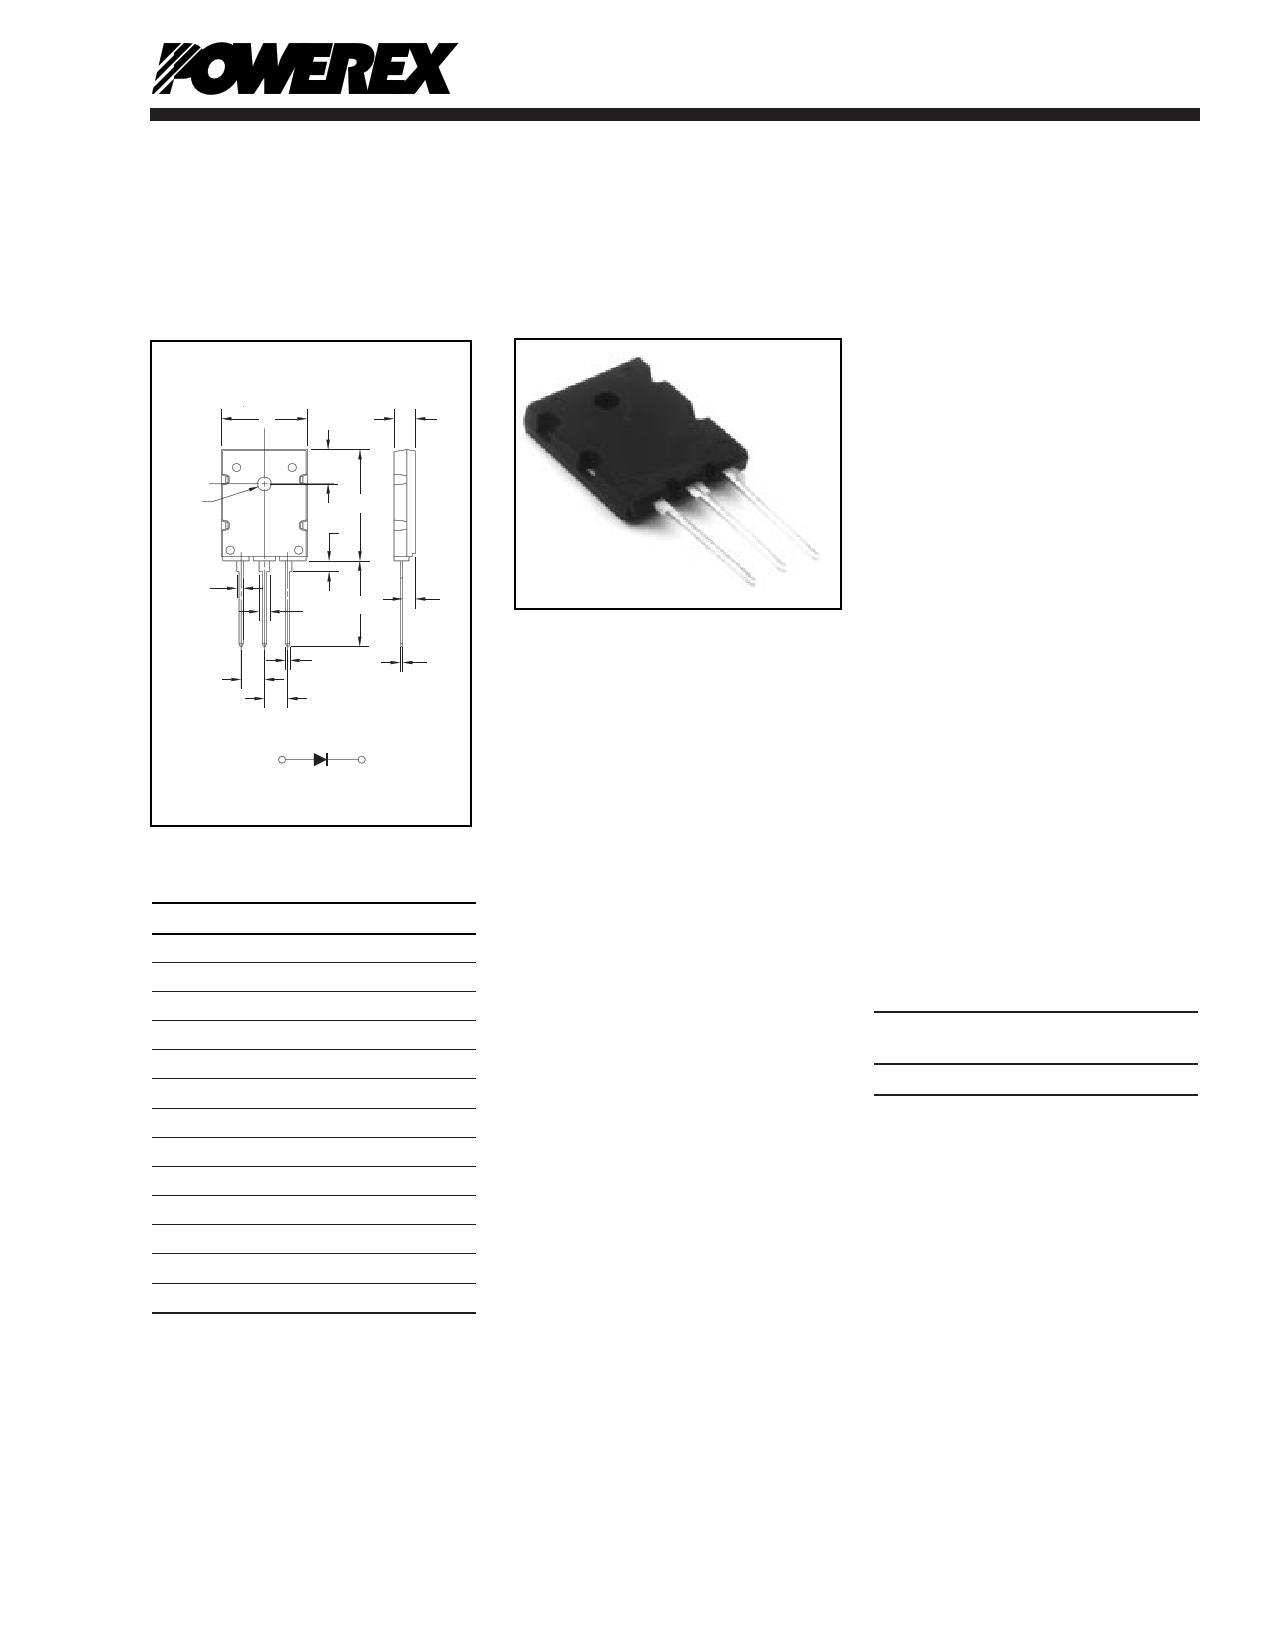 RM25HG-24S datasheet